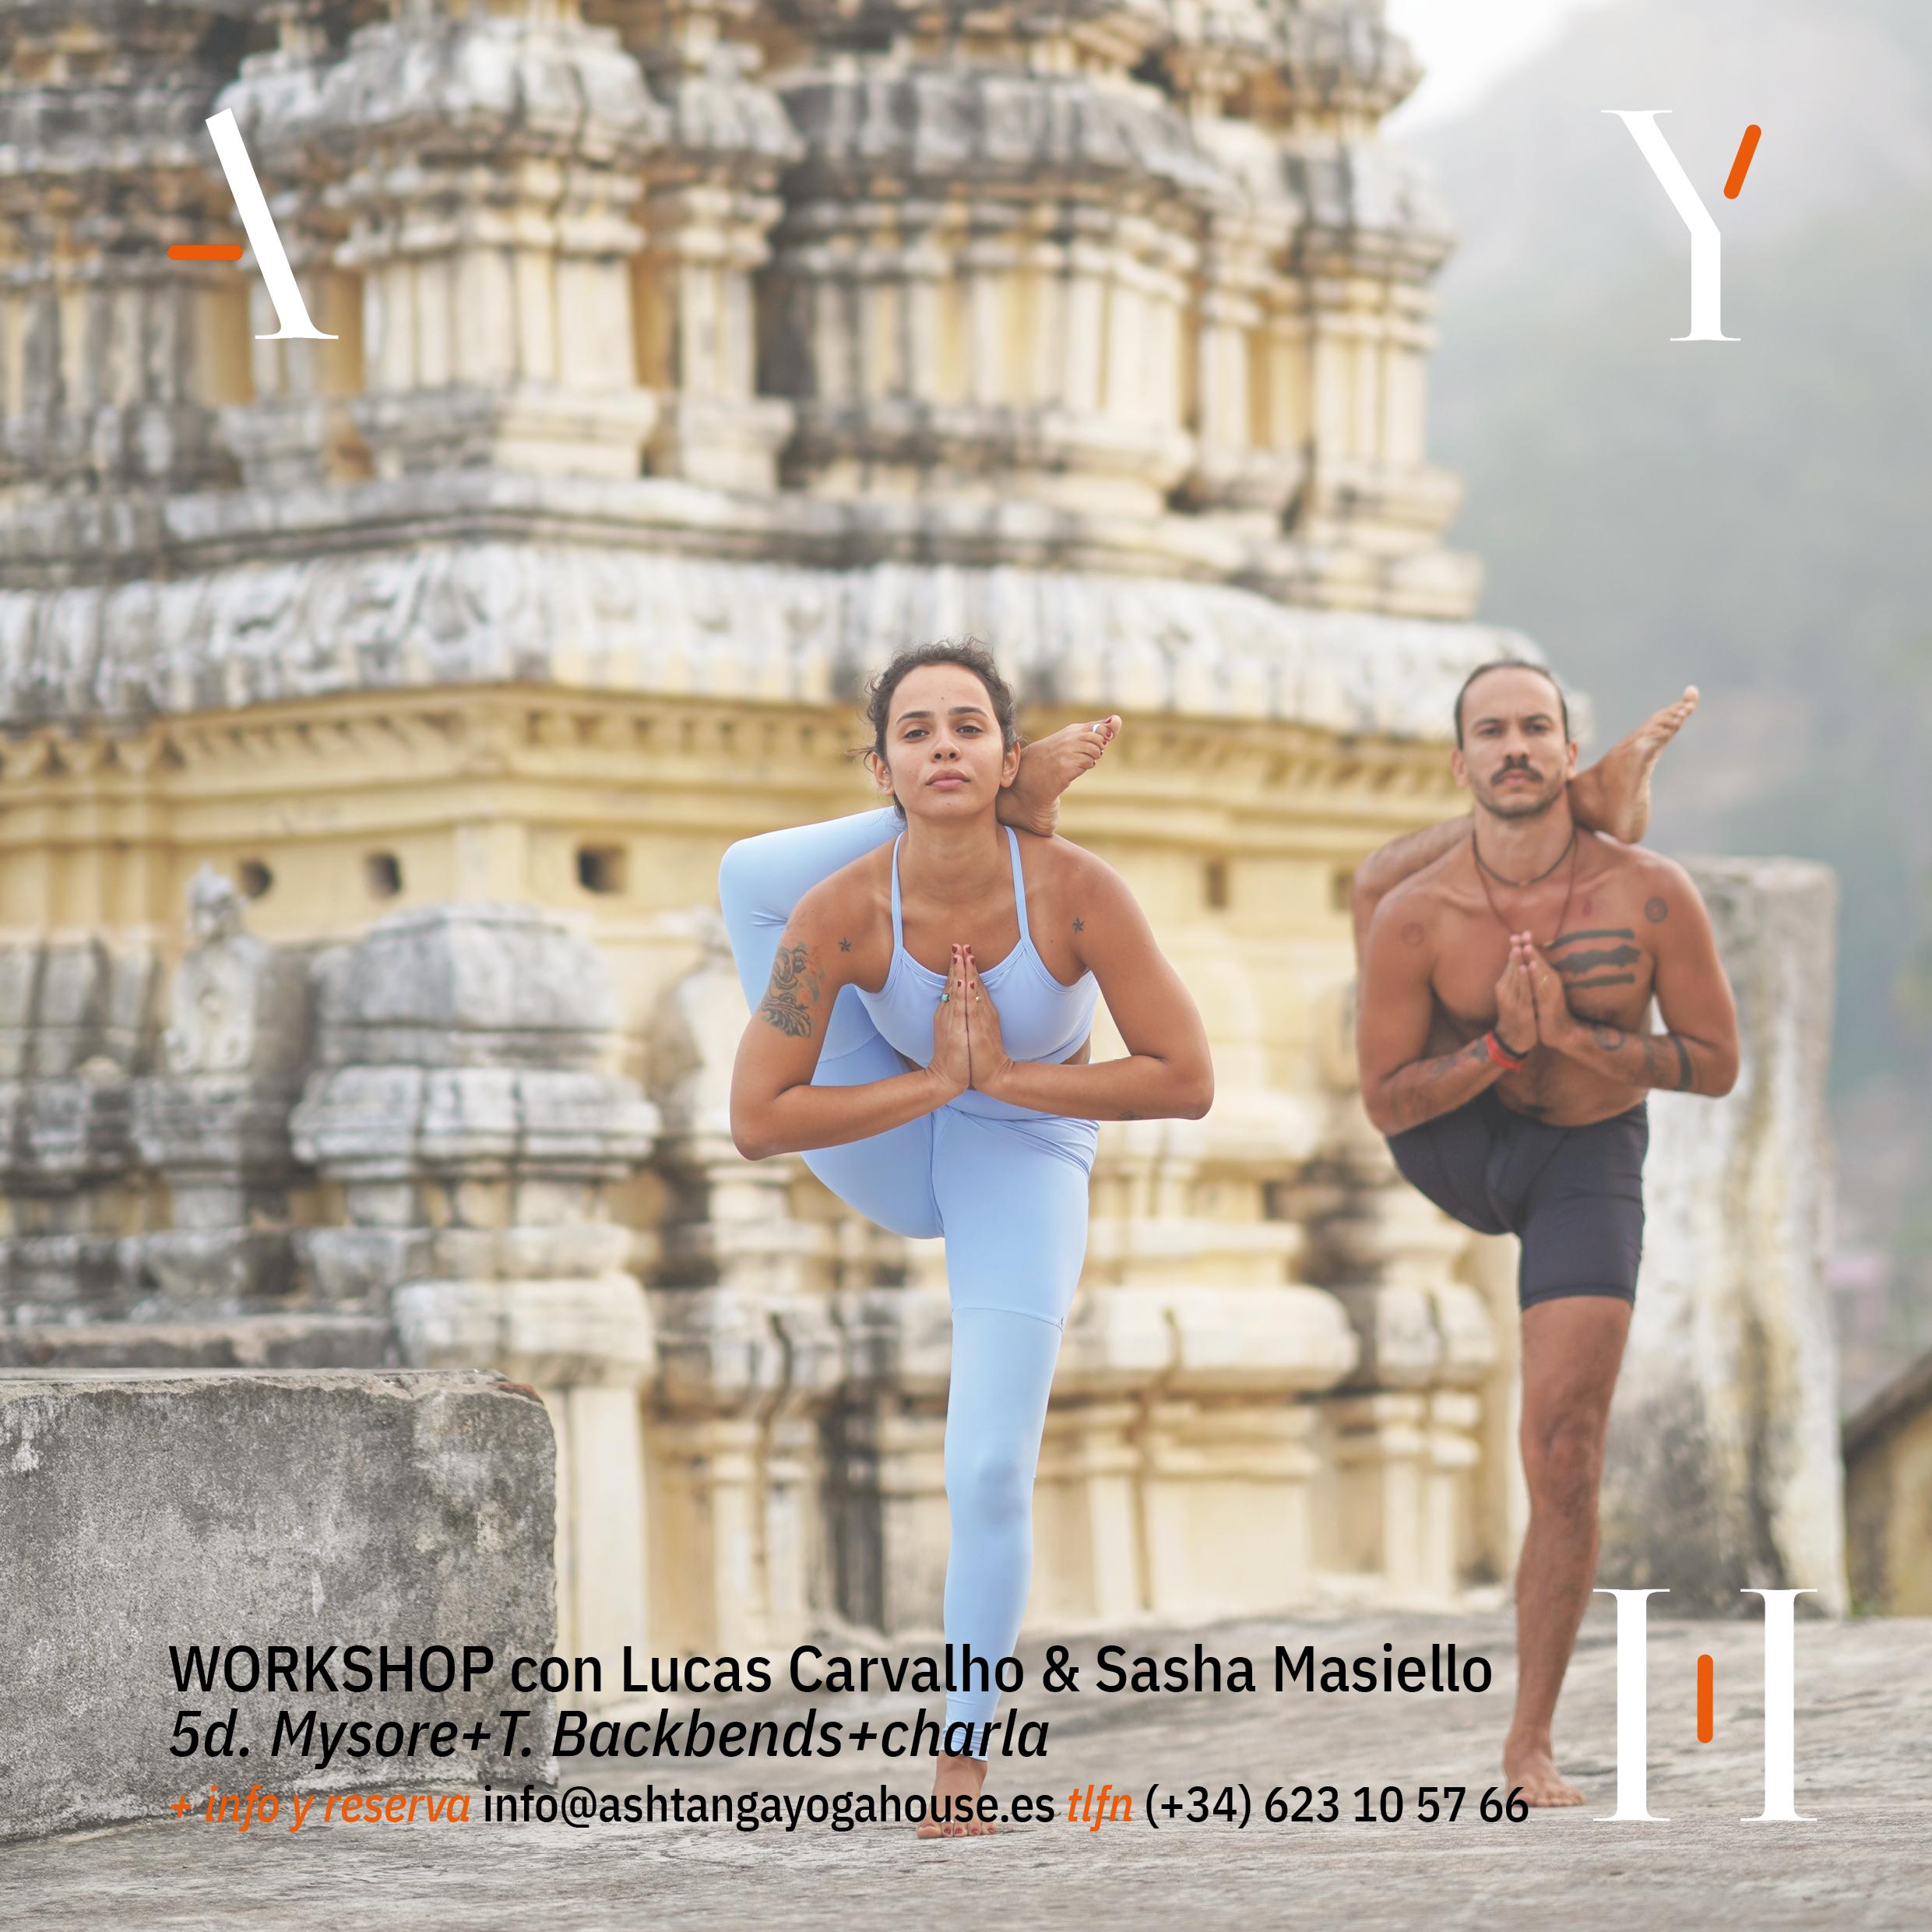 Curso-Ashtanga-yoga-house-valencia-mysore-lucas-carvalho-sasha-masiello- jpg 22